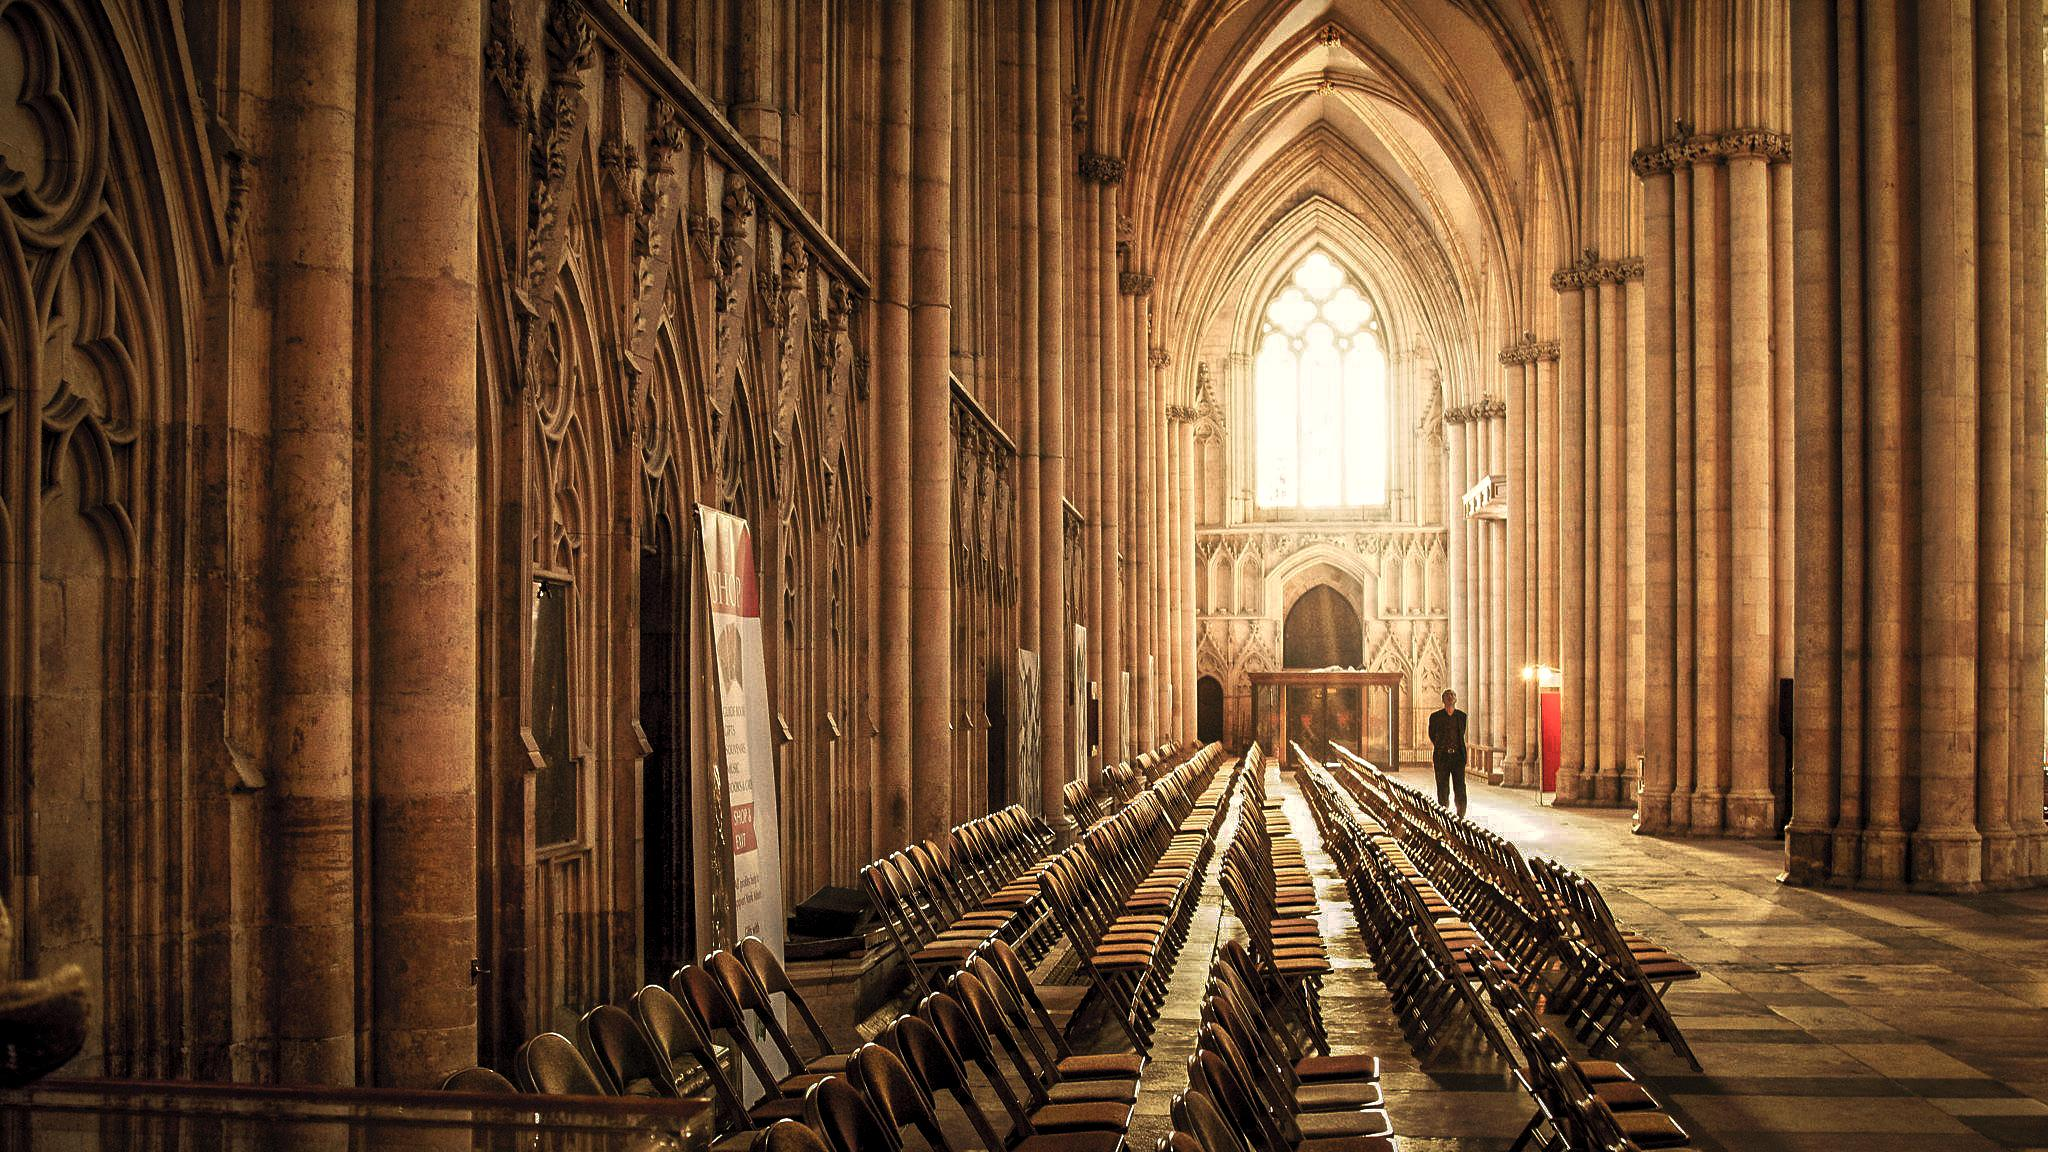 York Minster by Tony Shaw